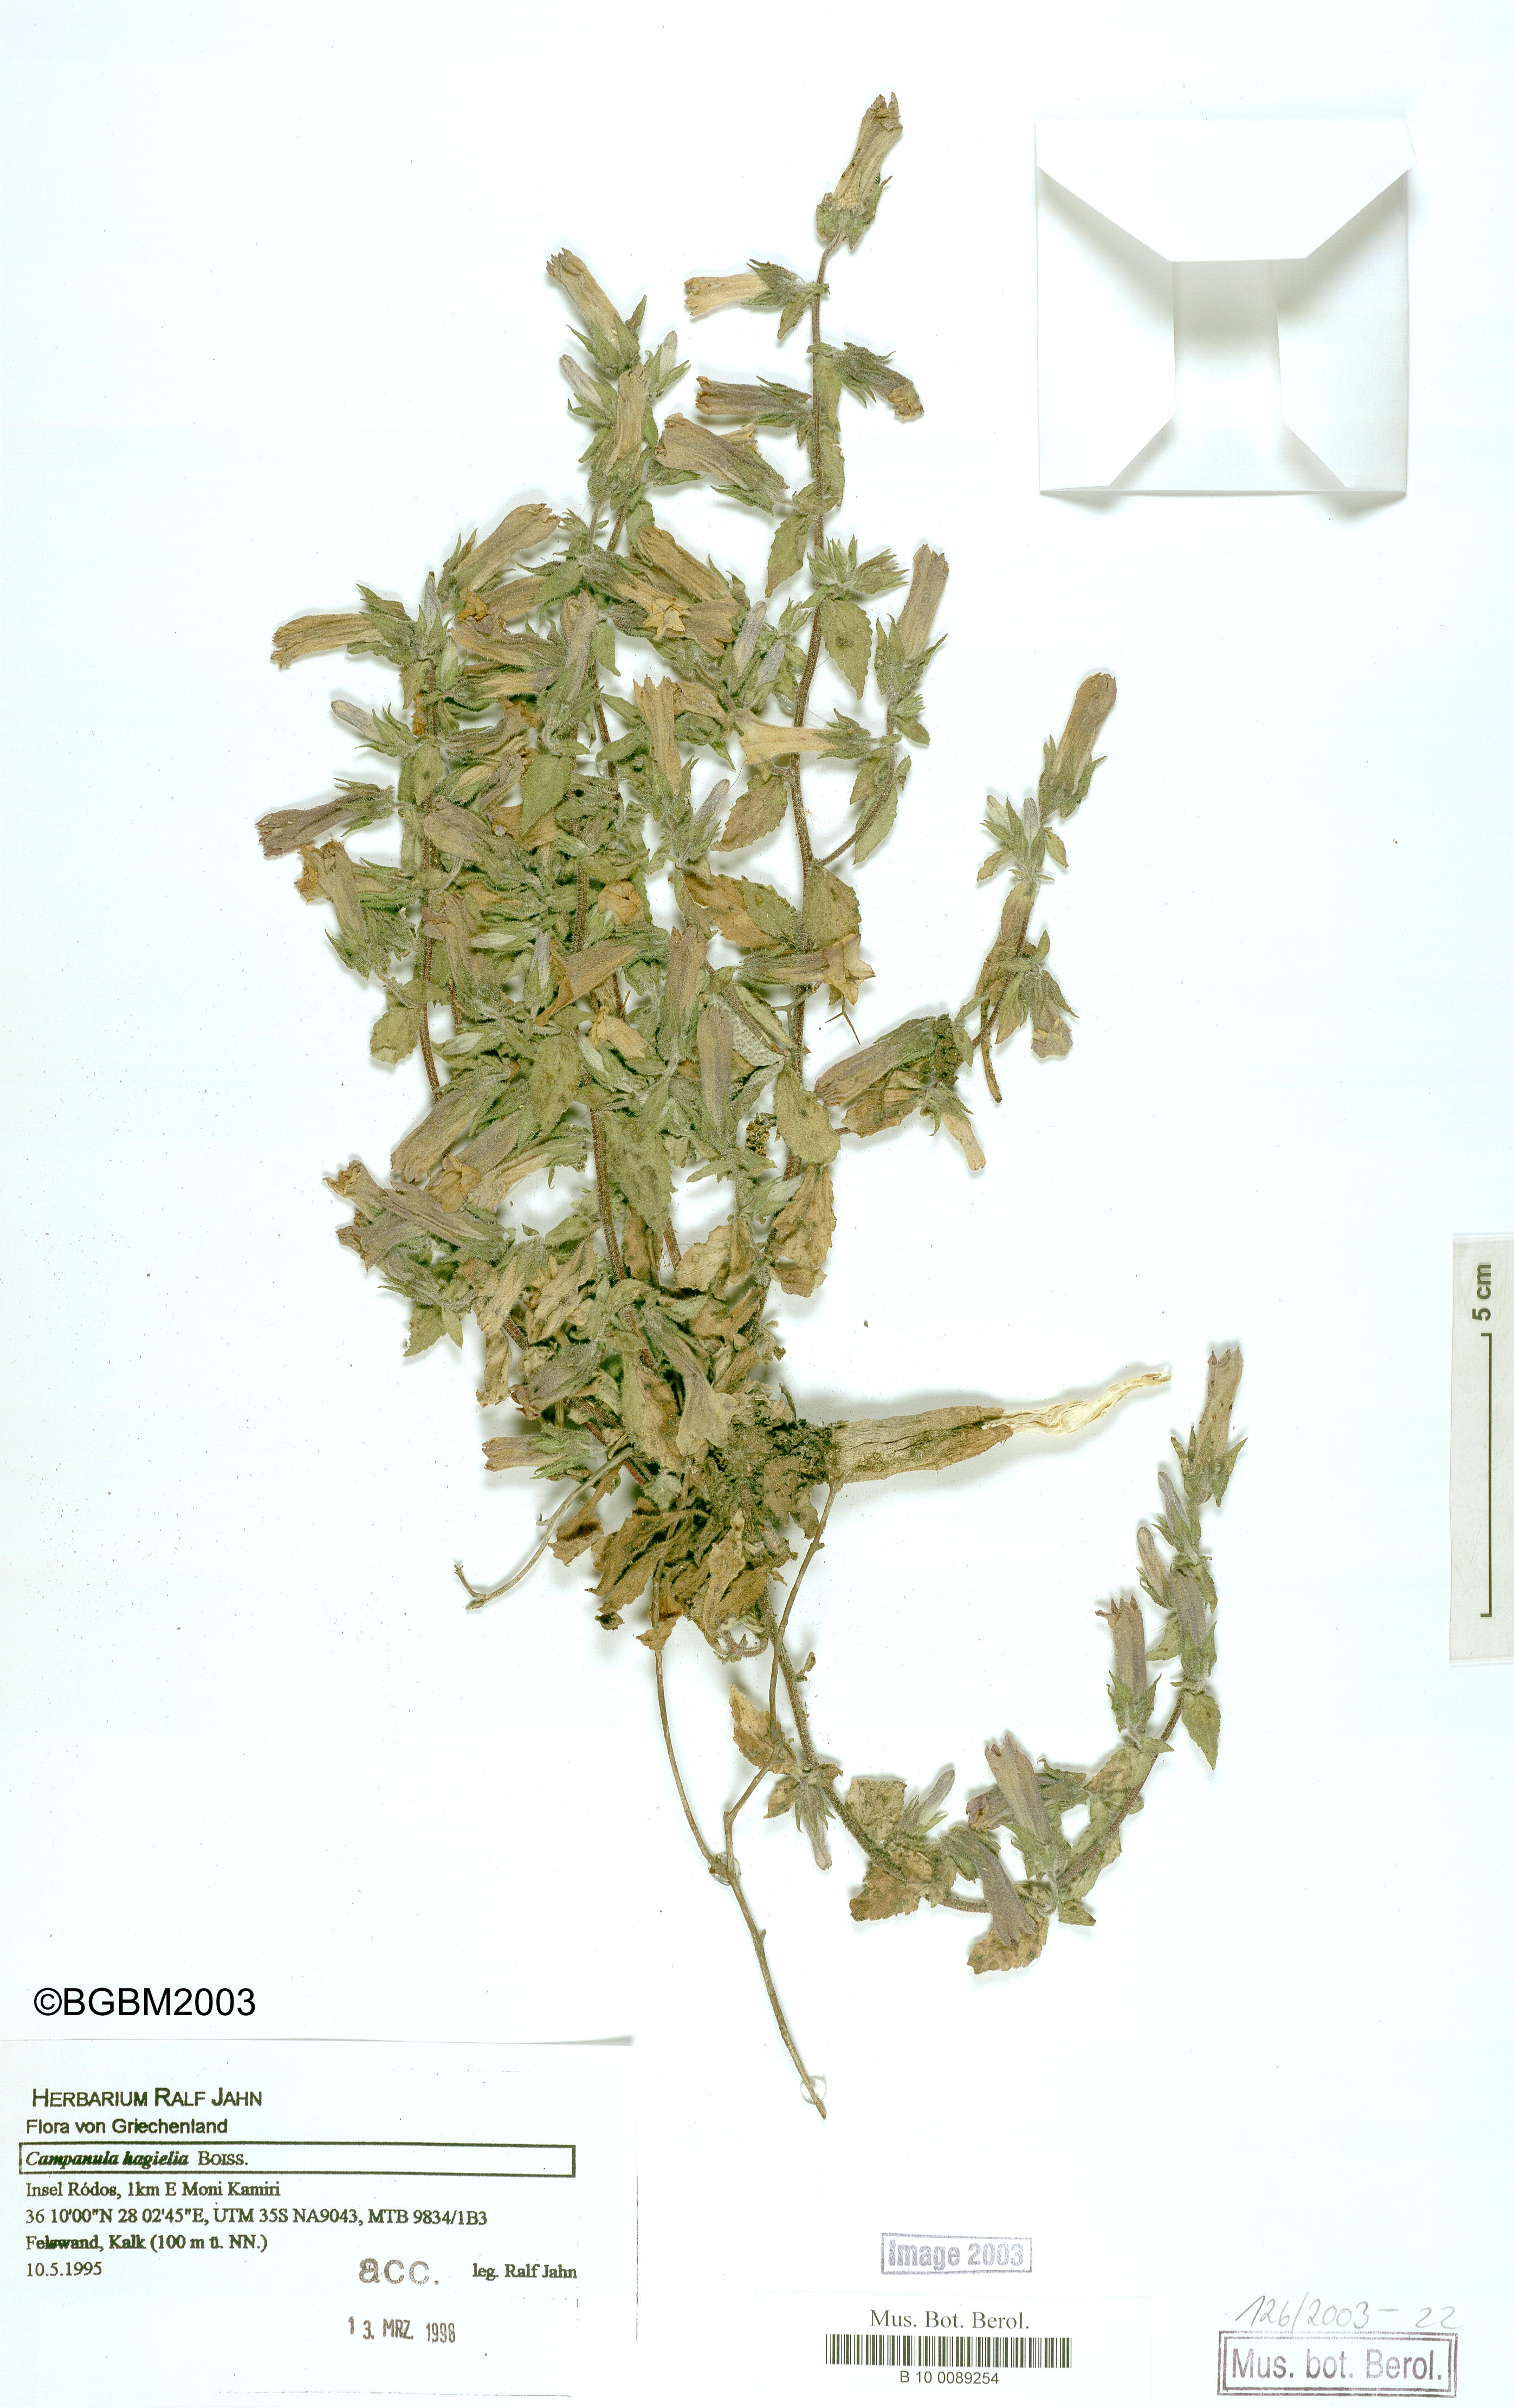 http://ww2.bgbm.org/herbarium/images/B/10/00/89/25/B_10_0089254.jpg